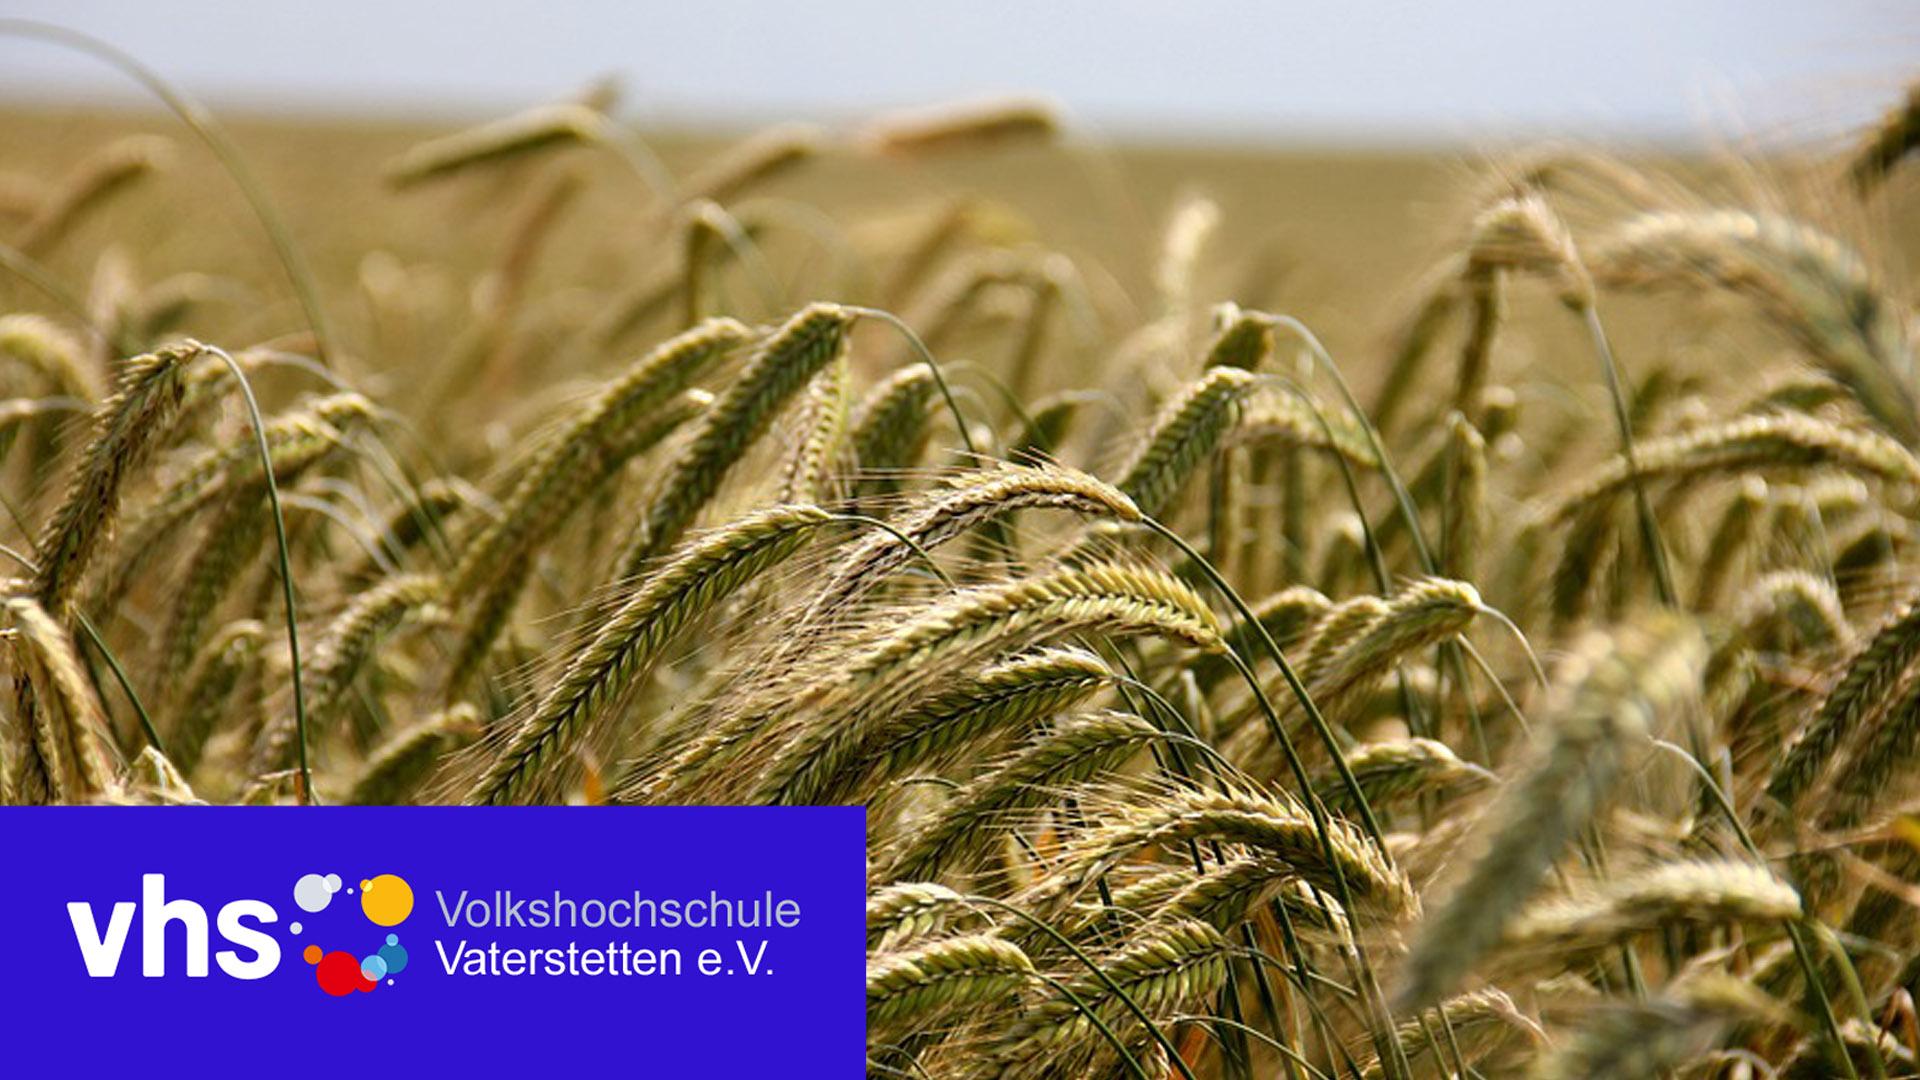 VHS Landwirtschaft